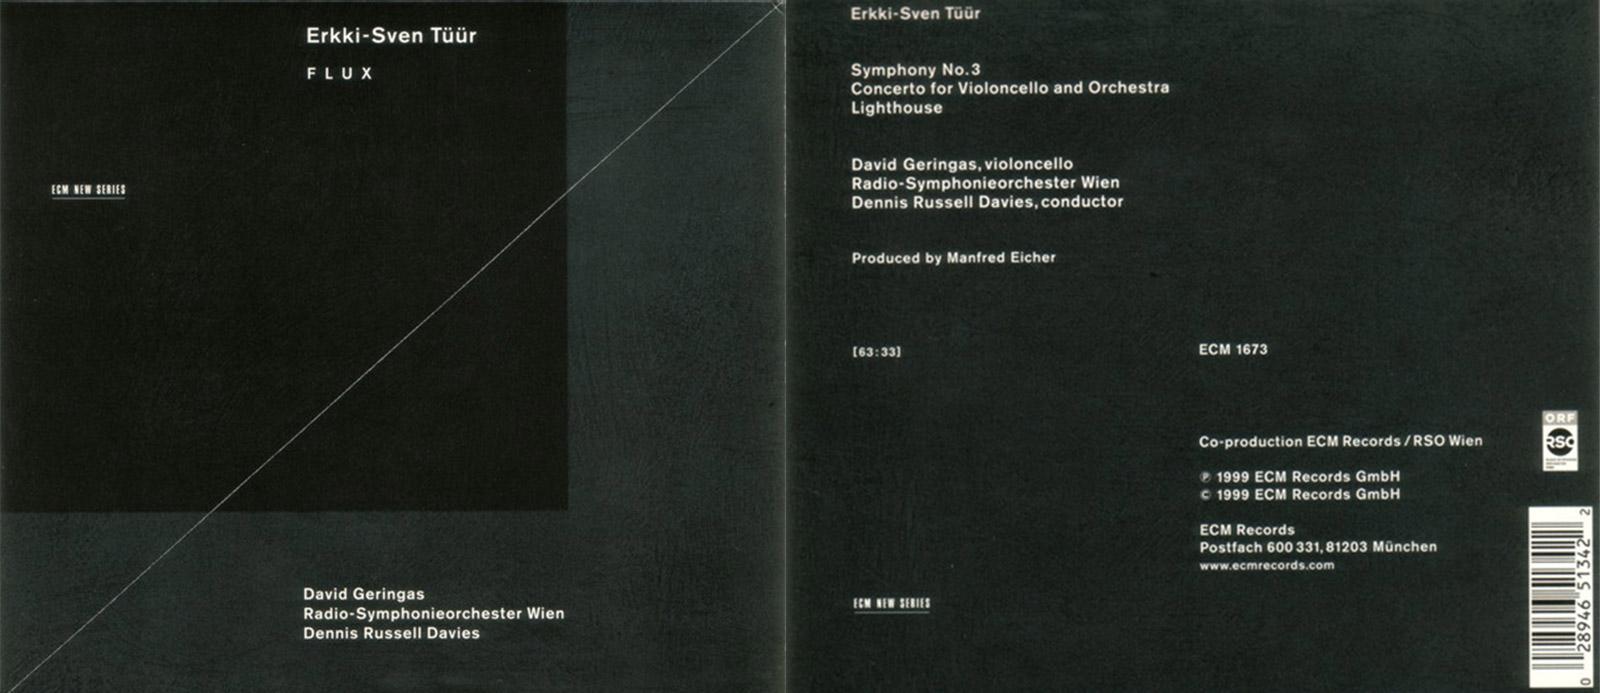 MusicWeb International | Erkki-Sven TÜÜR | by Hubert Culot